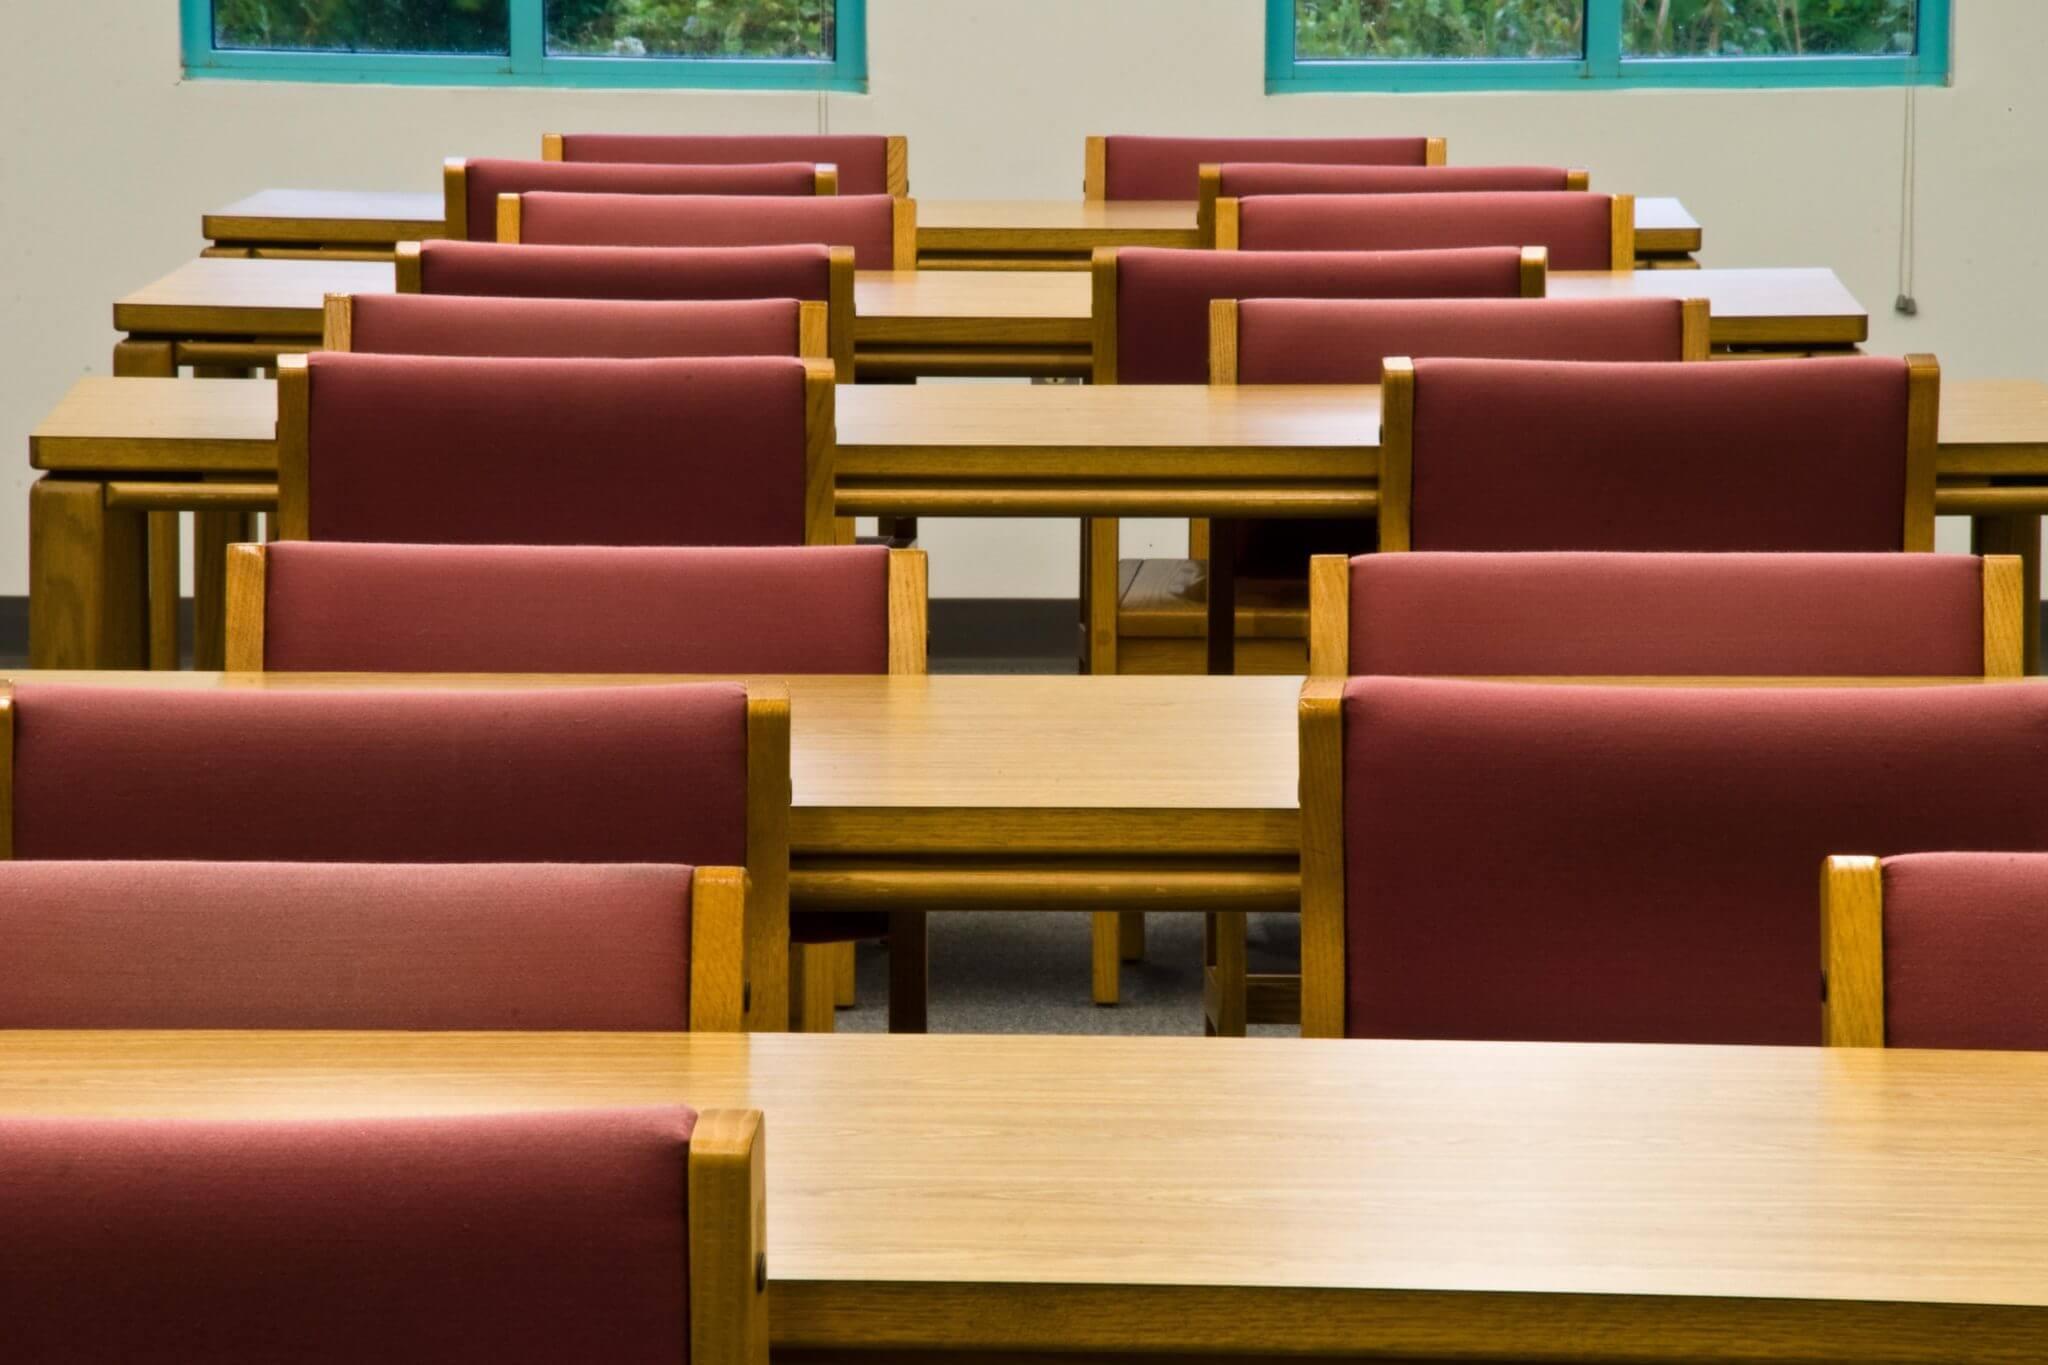 Classroom: Practice ASVAB Versus Real ASVAB